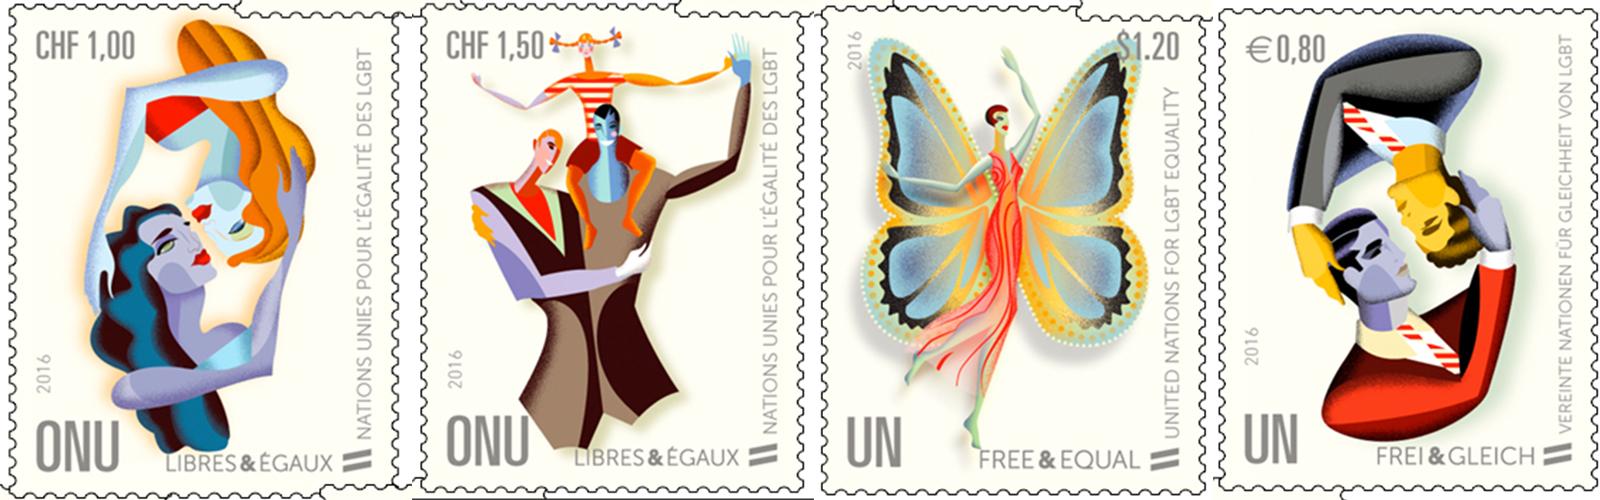 UN-Stamps